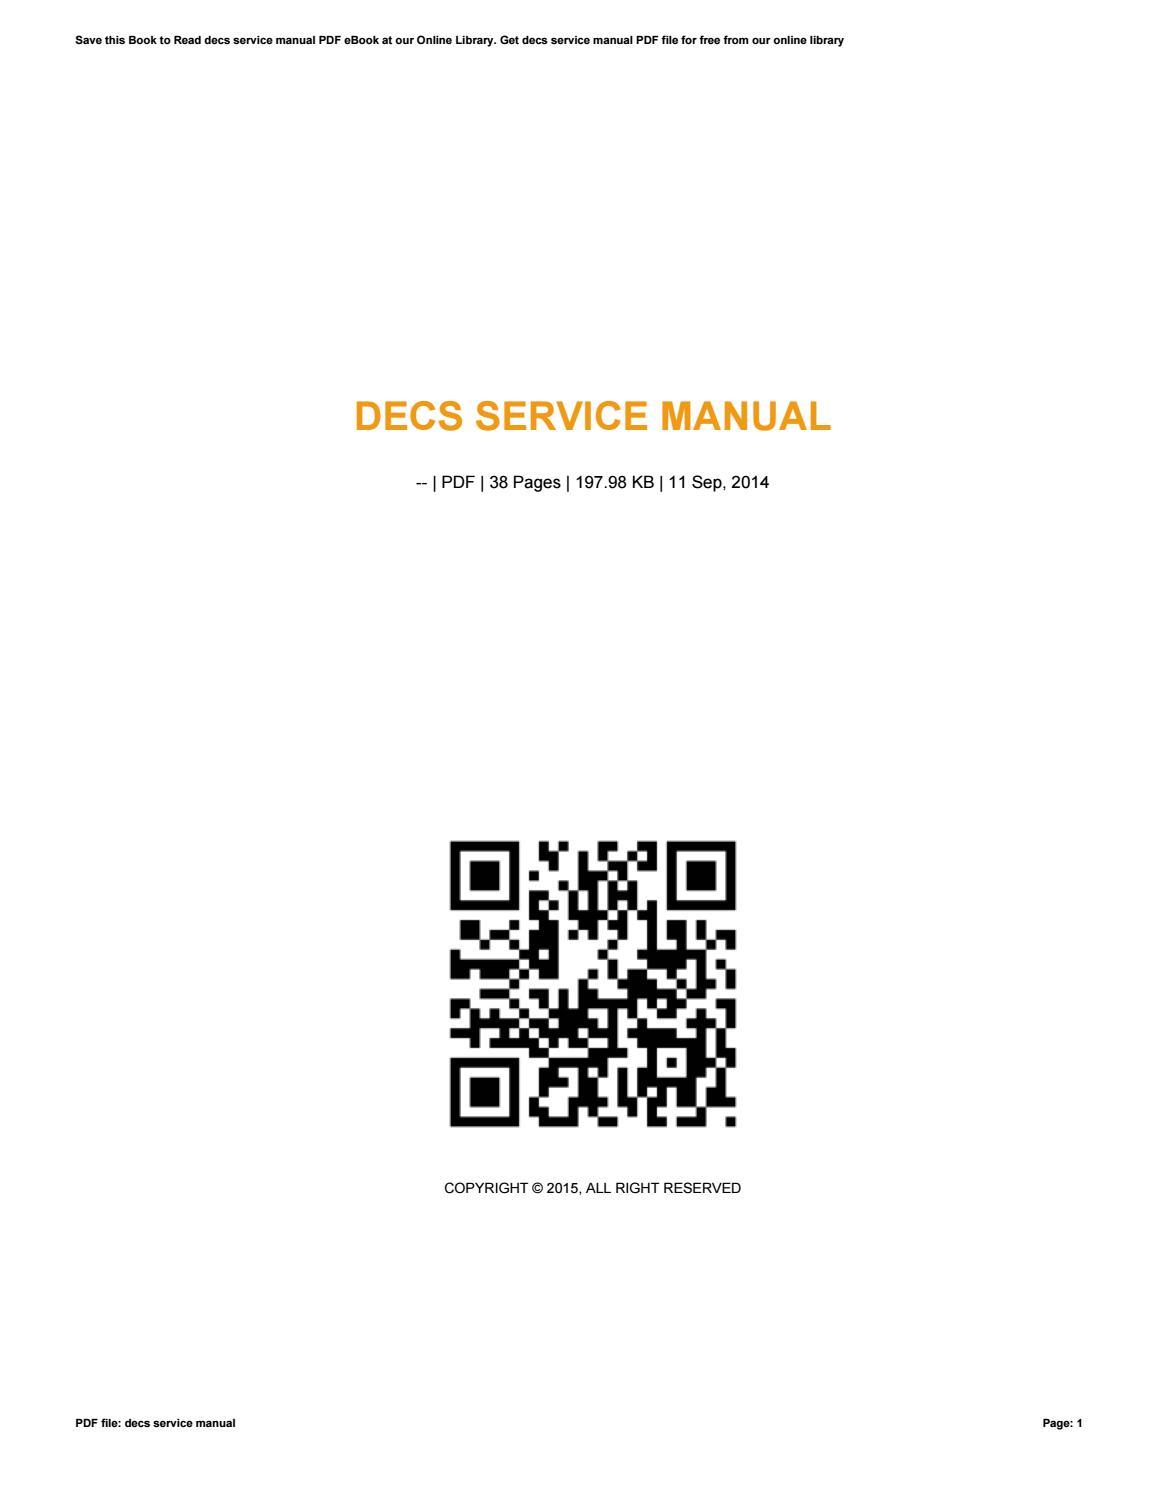 decs service manual by c0572 issuu rh issuu com decs service manual 2000 pdf free download decs service manual 2010